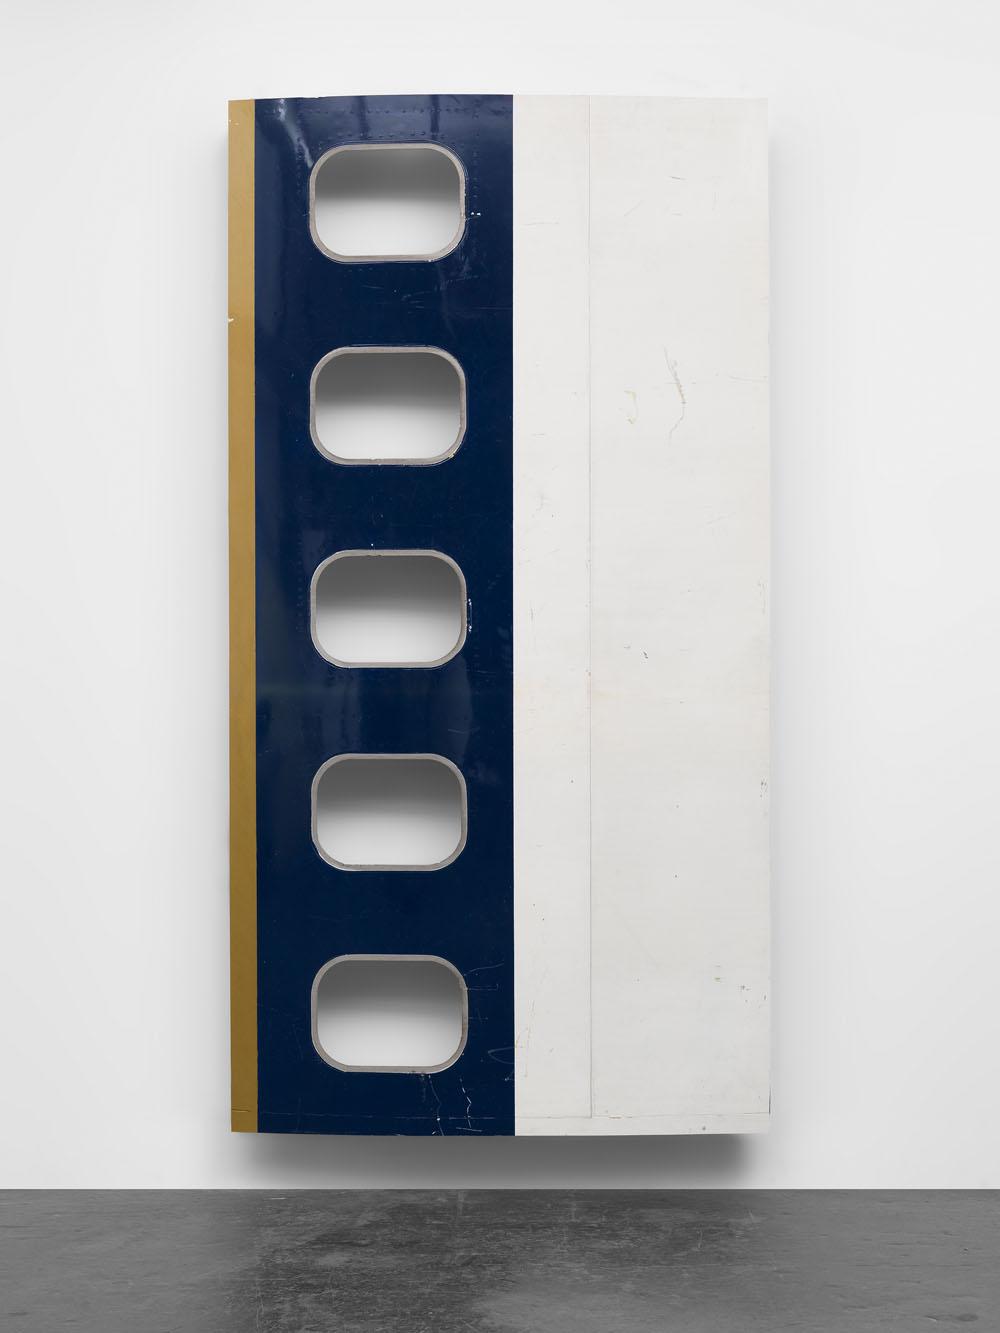 Michail Pirgelis Noble Descent, 2015 Aluminium, titan, lacquer 265 x 139 x 20 cm 104 1/4 x 54 3/4 x 7 7/8 inches © Michail Pirgelis Courtesy Sprüth Magers